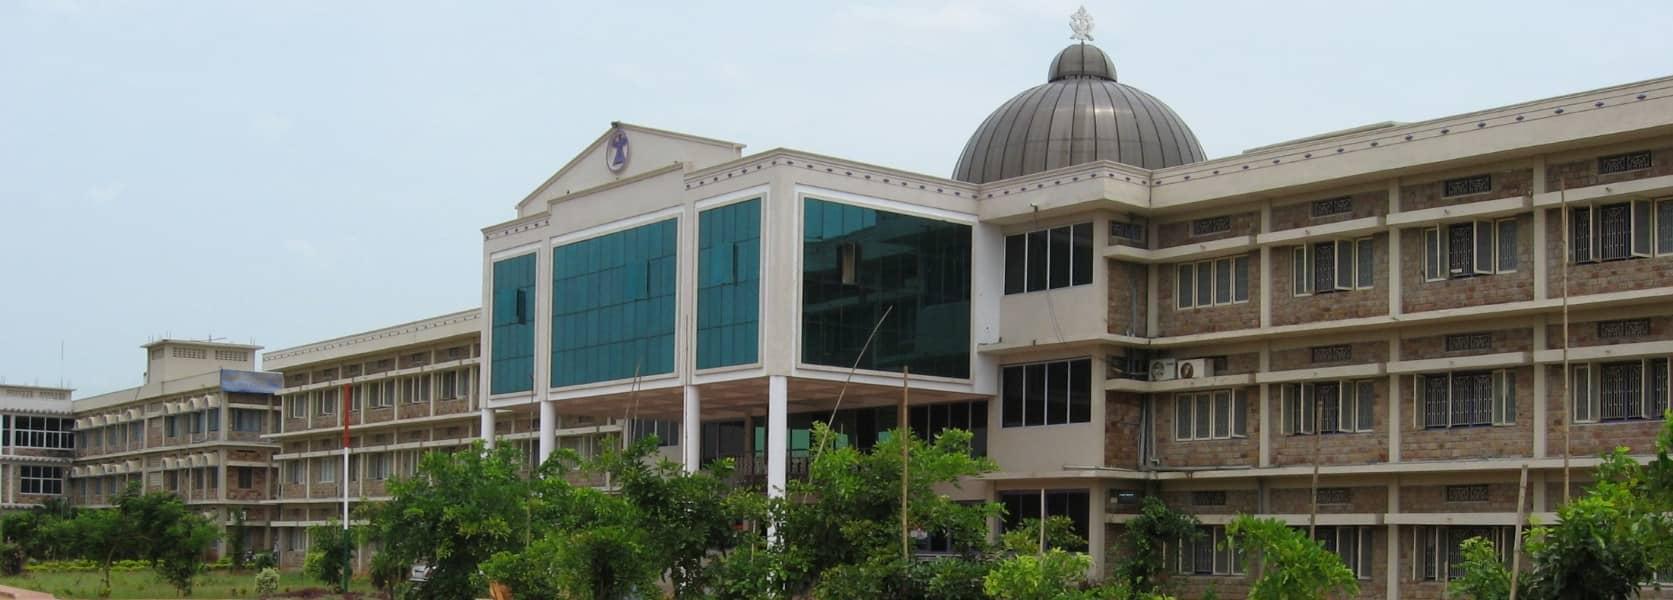 St Joseph Dental College